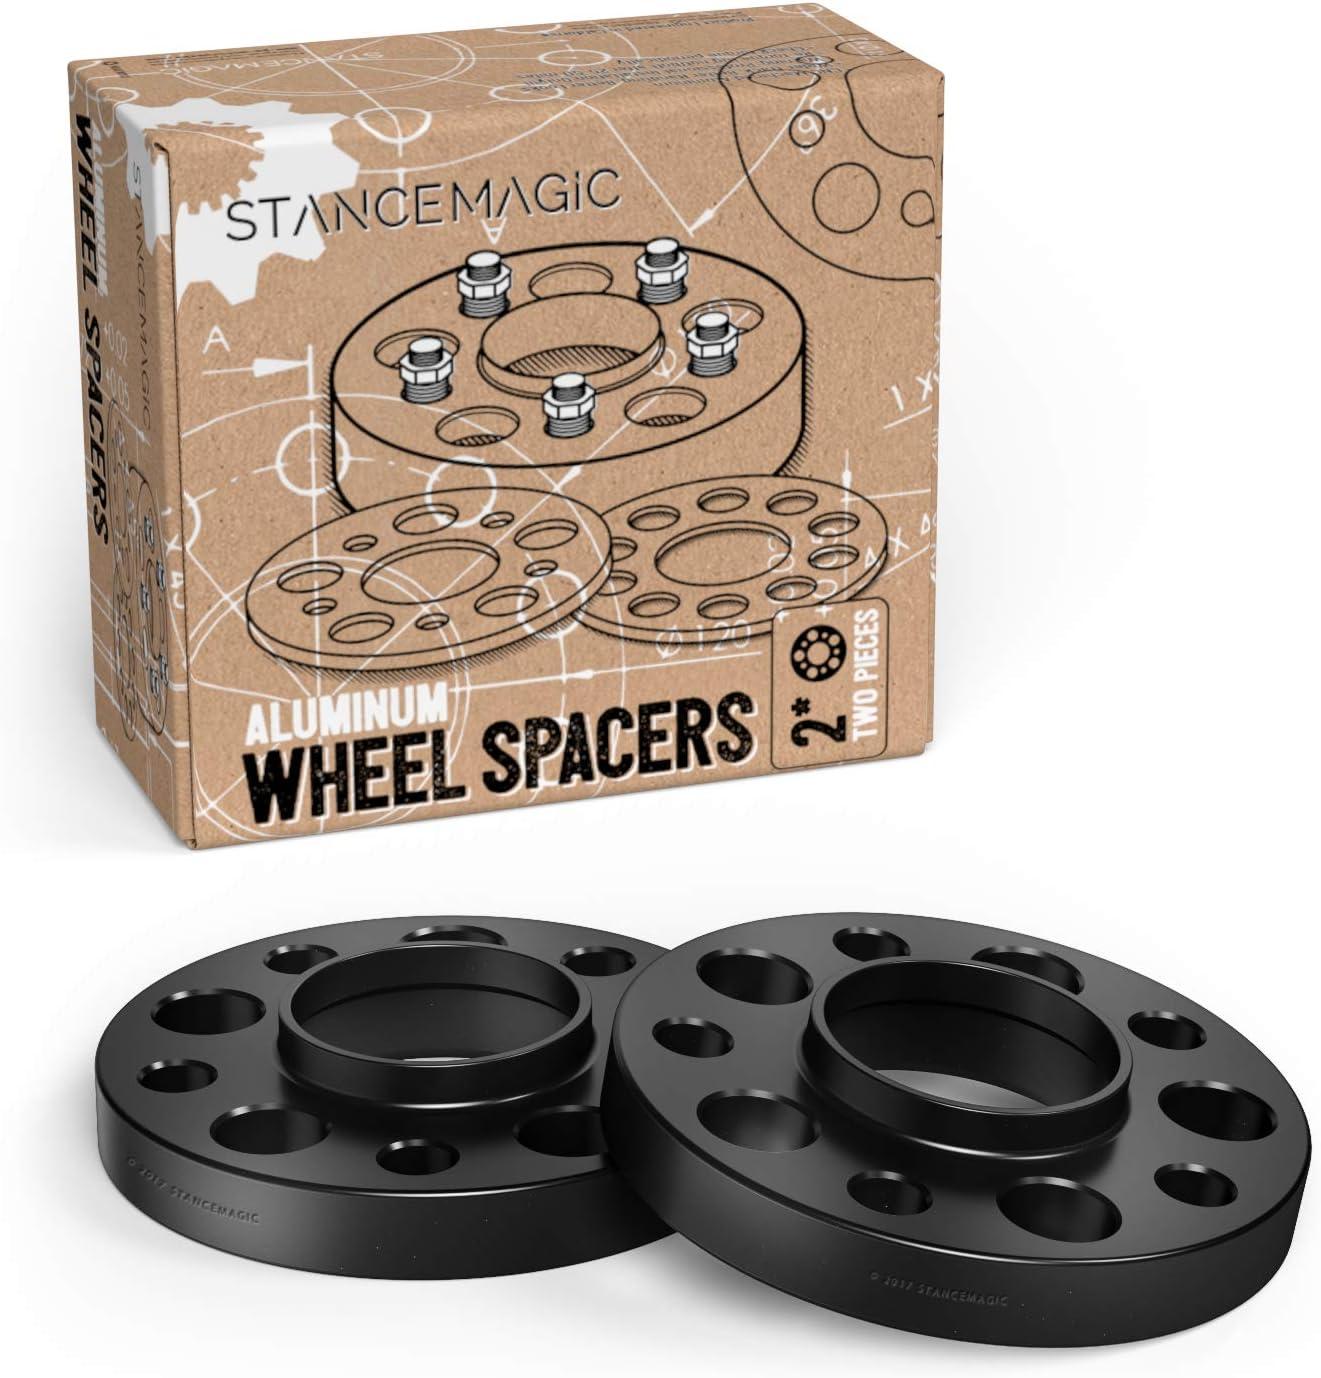 2x25mm Black Hub Wheel Spacers 5x130 for Porsche Cayenne 3.6 GTS 3.0 S E-Hybrid